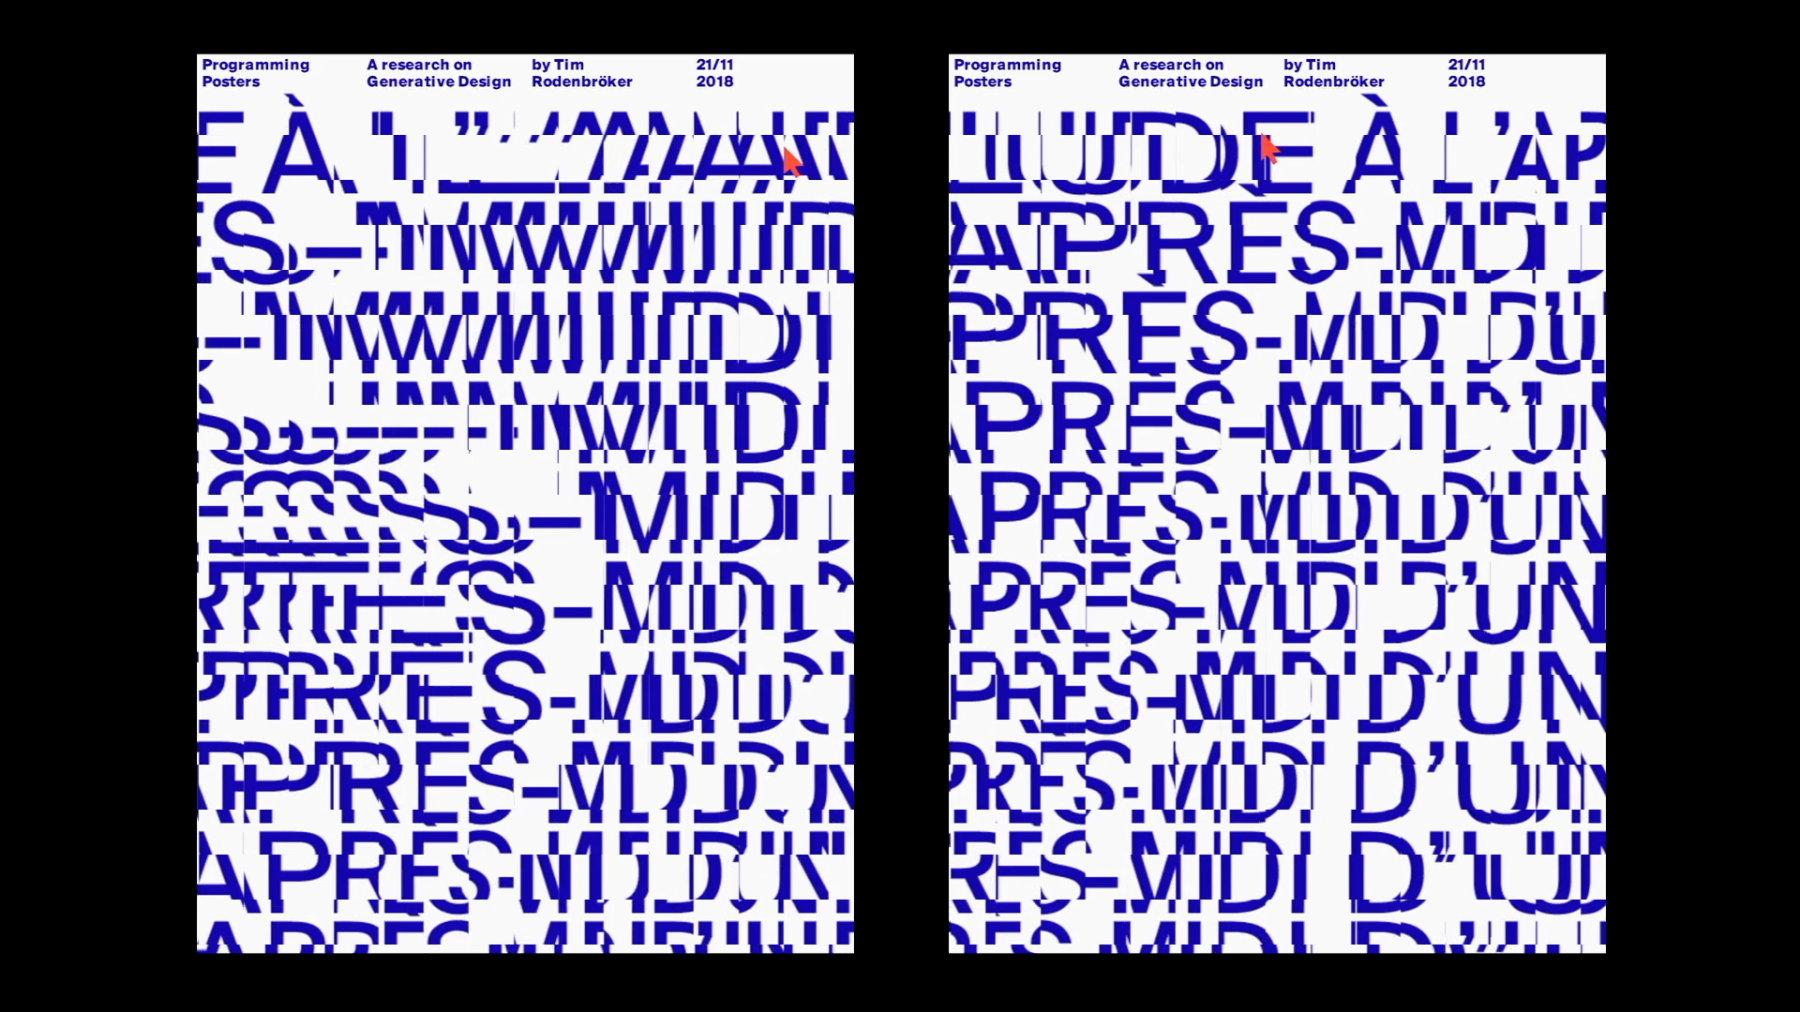 programming posters